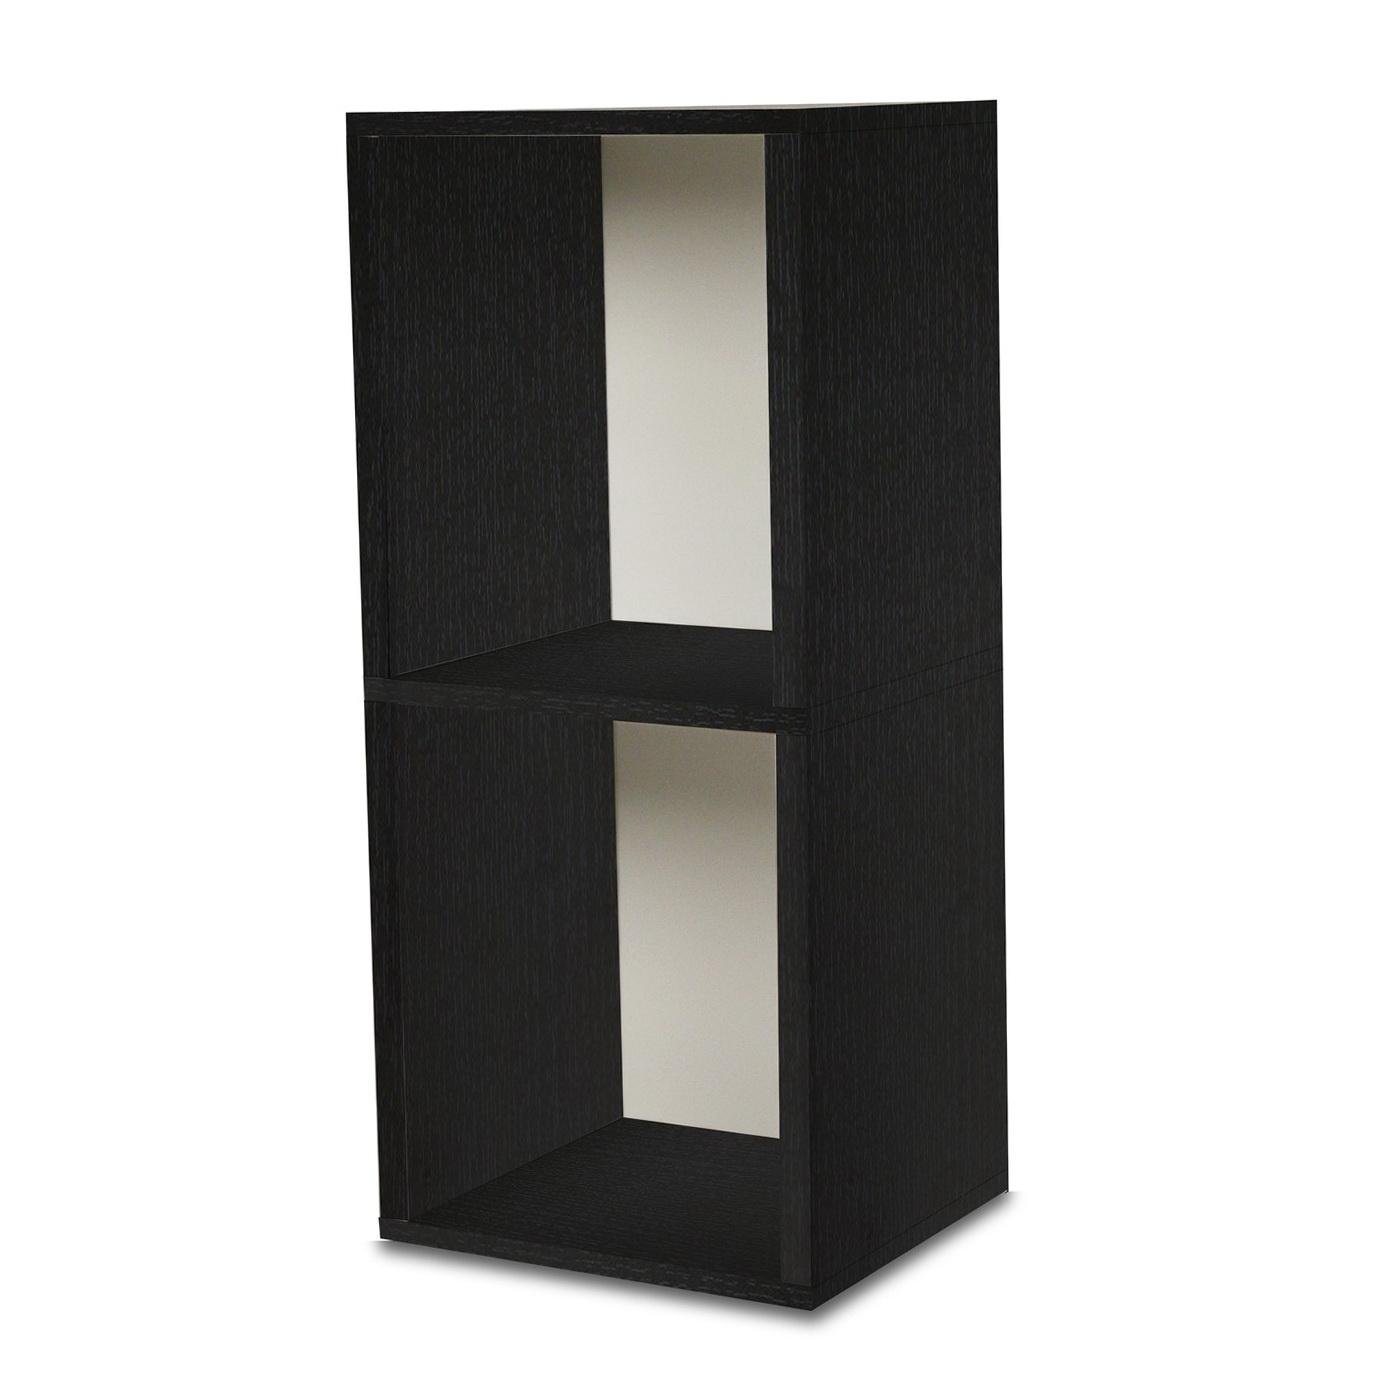 Black 2 Shelf Bookcase